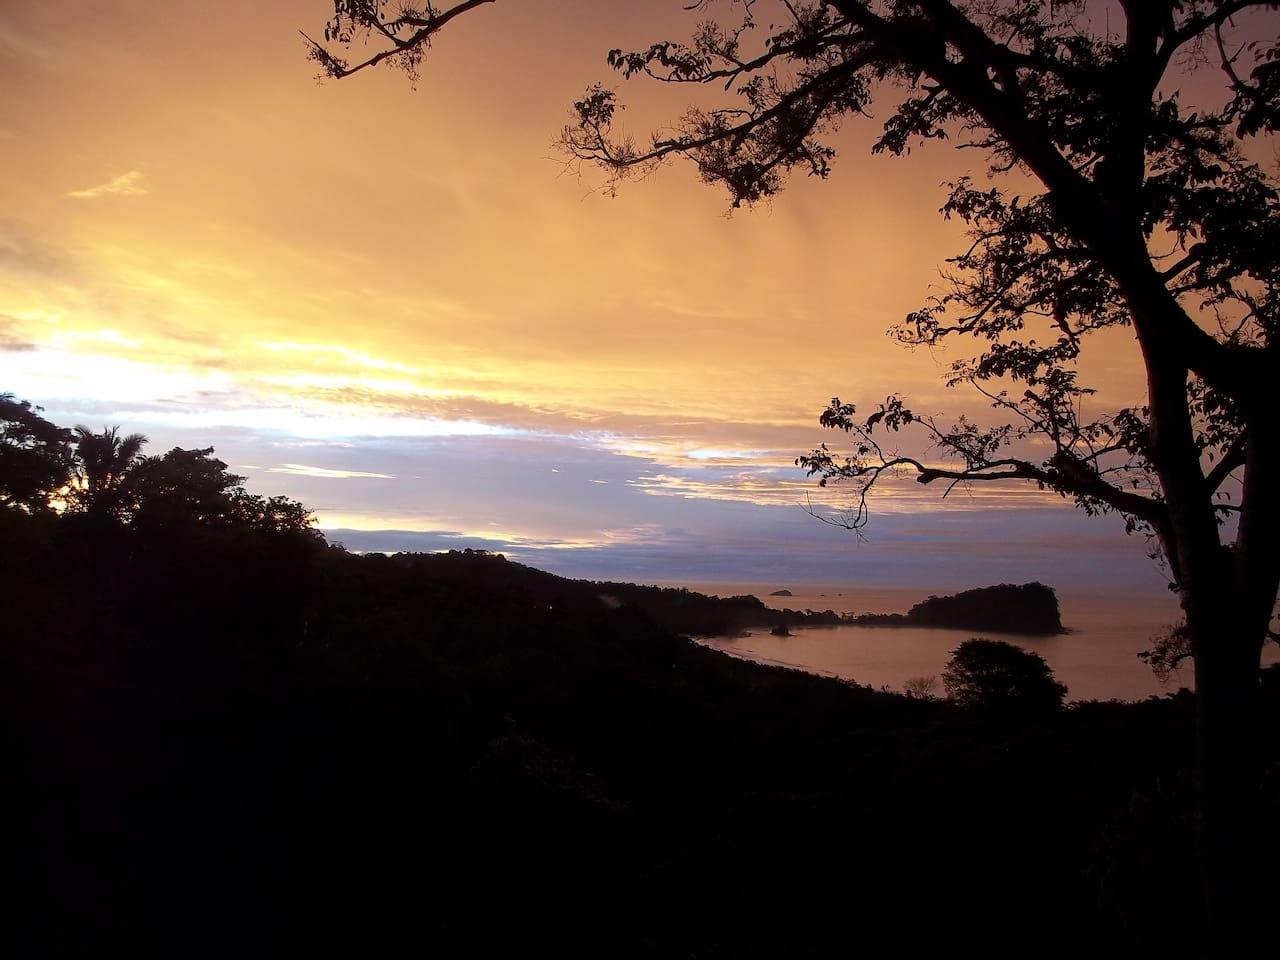 Sunrise from Casa Buena Vista